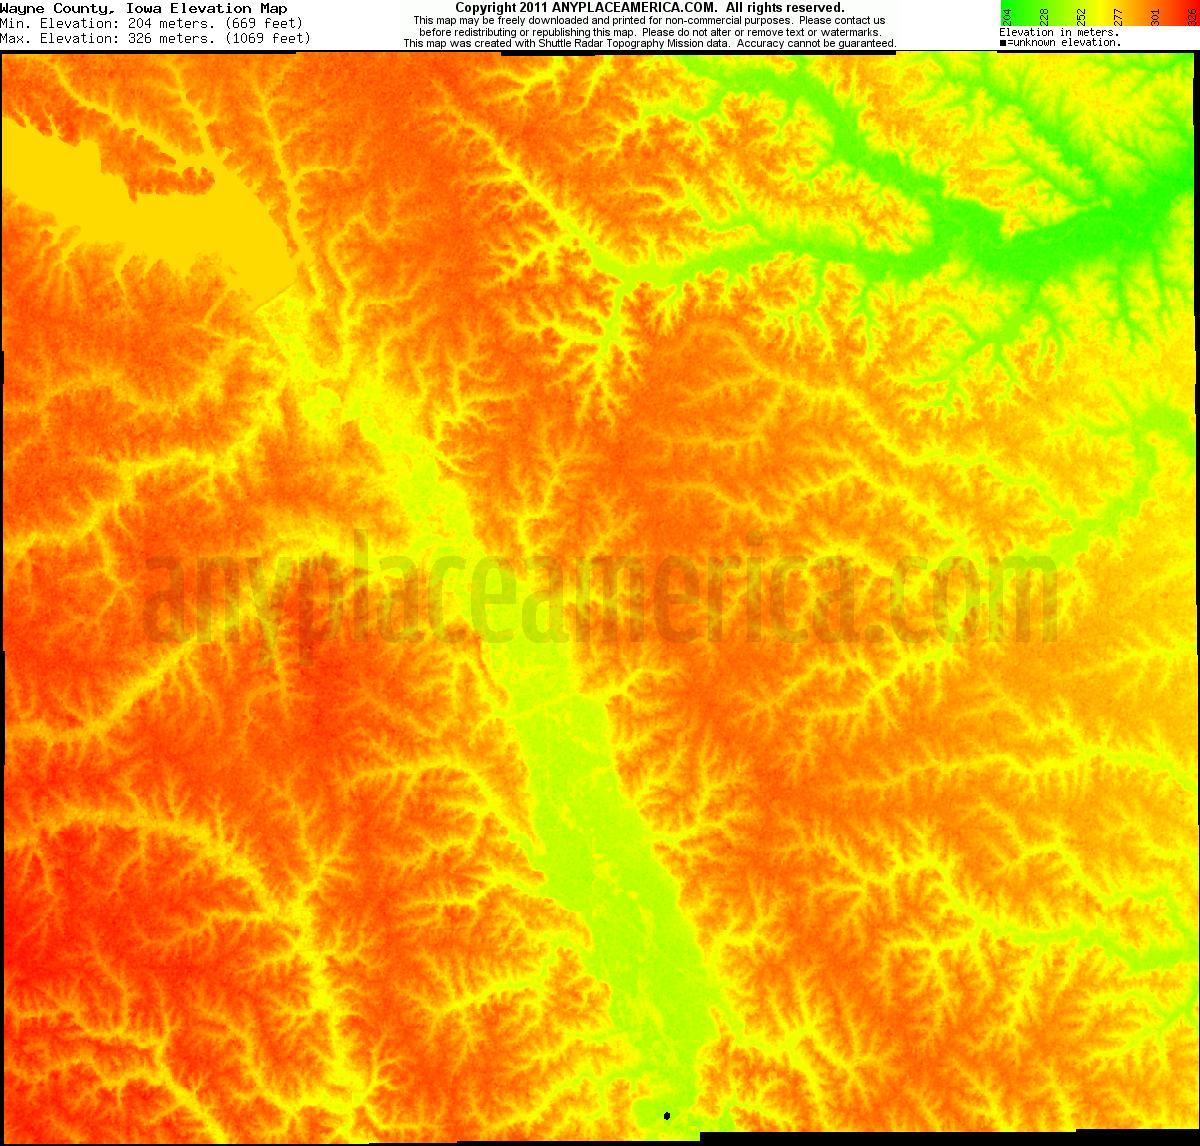 free wayne county iowa topo maps elevations free wayne county iowa topo maps